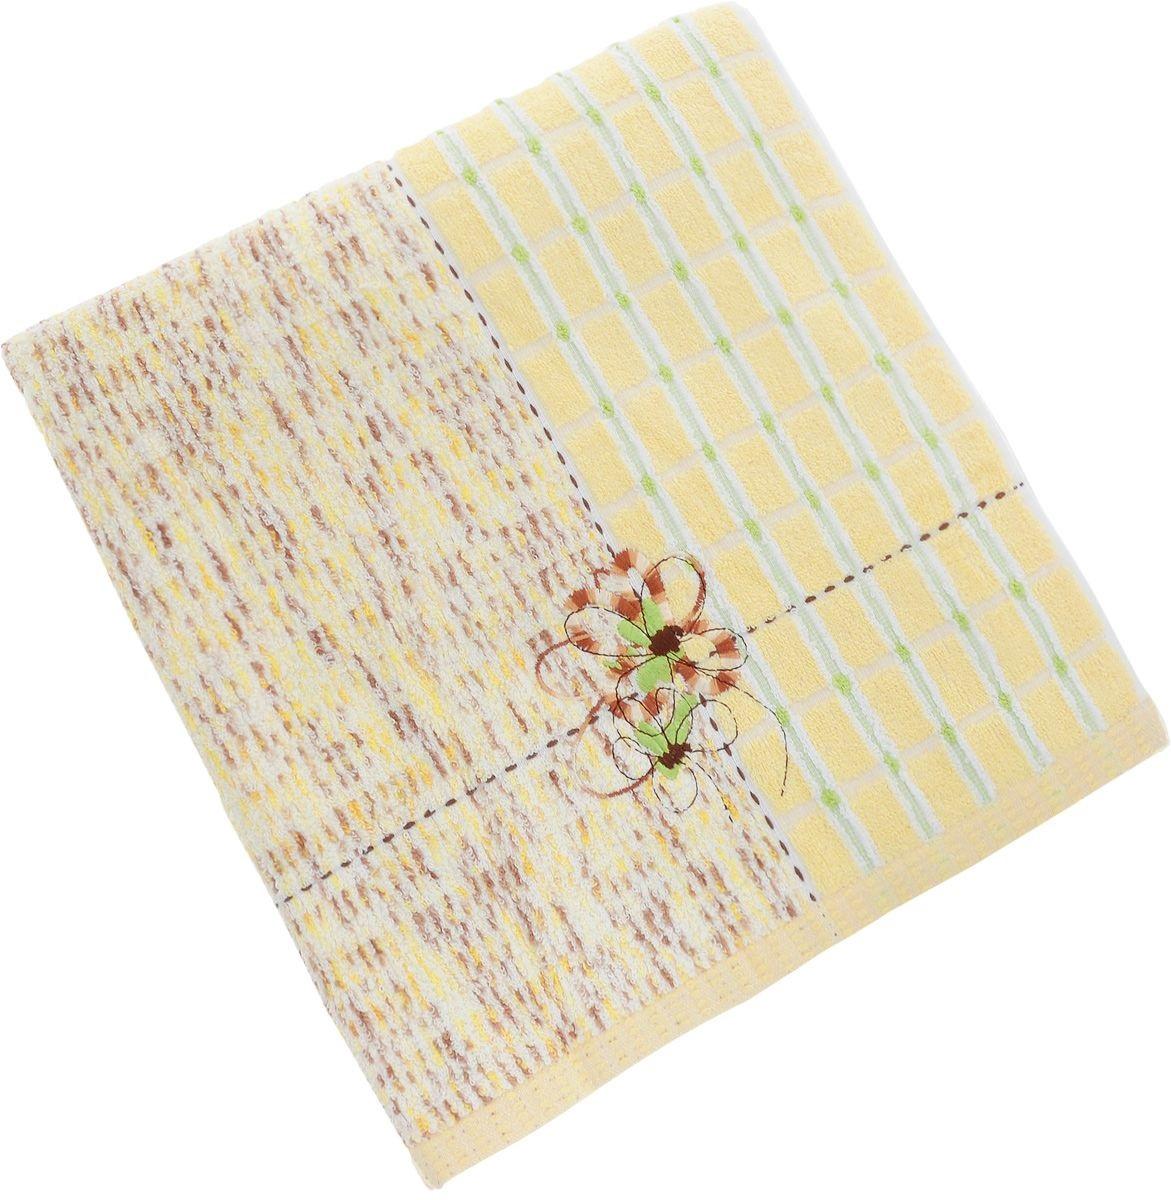 Полотенца Soavita Полотенце Sandra Цвет: Желтый (70х140 см) полотенца soavita полотенце sandra цвет желтый 50х90 см